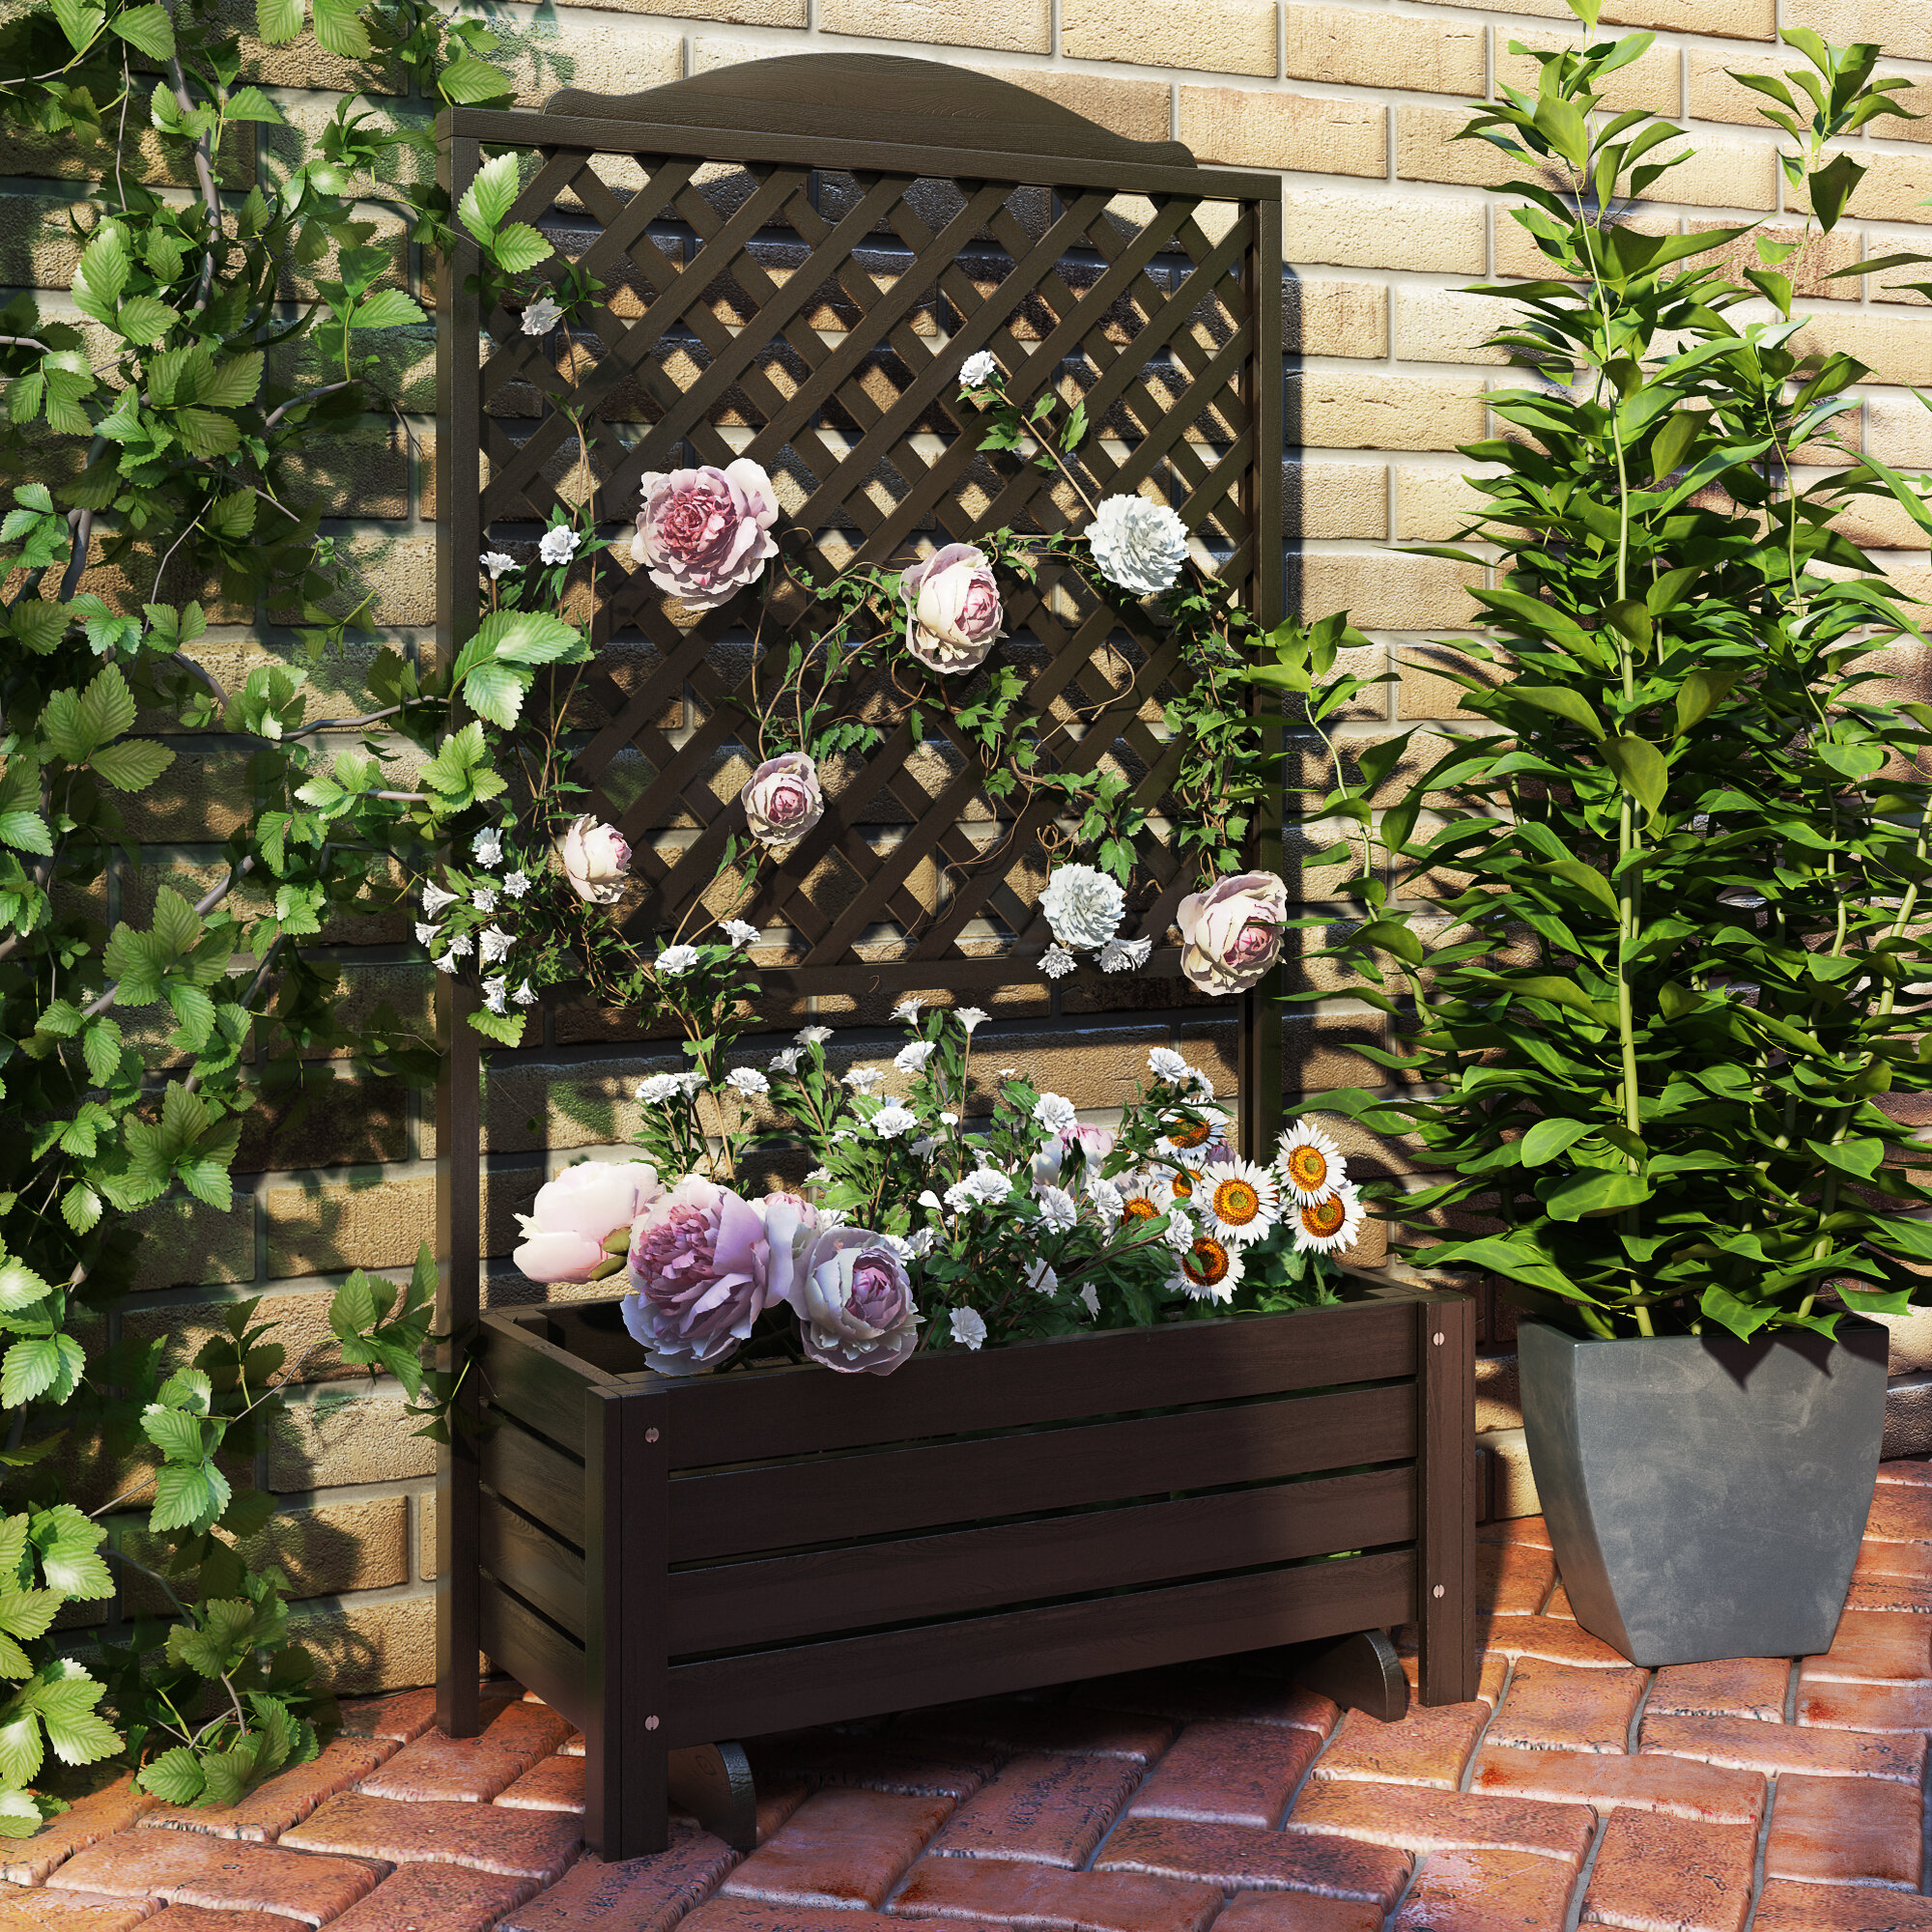 Romantica Wooden Planter Box With Trellis